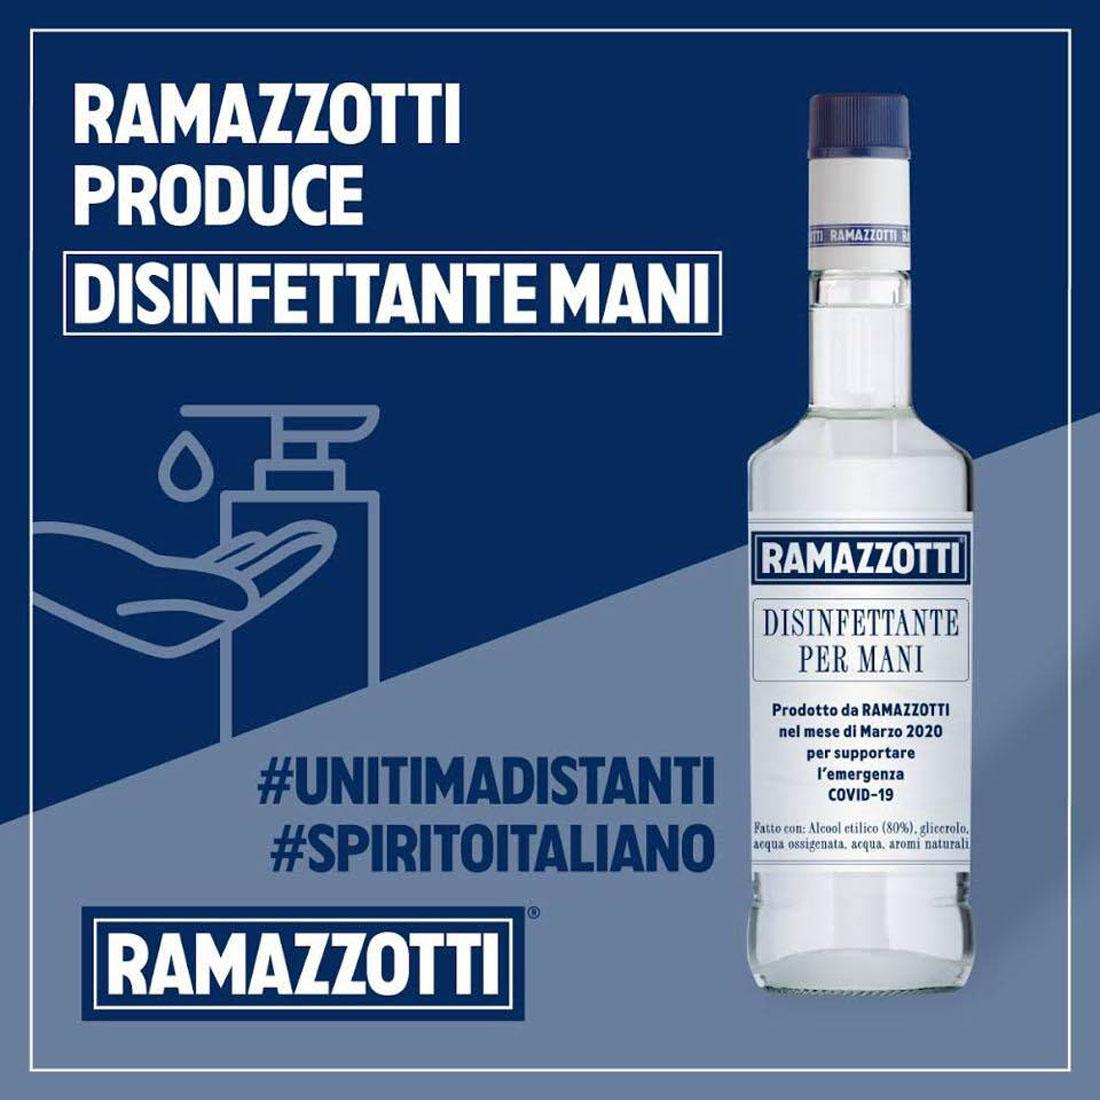 ramazzotti-disinfettante-145539